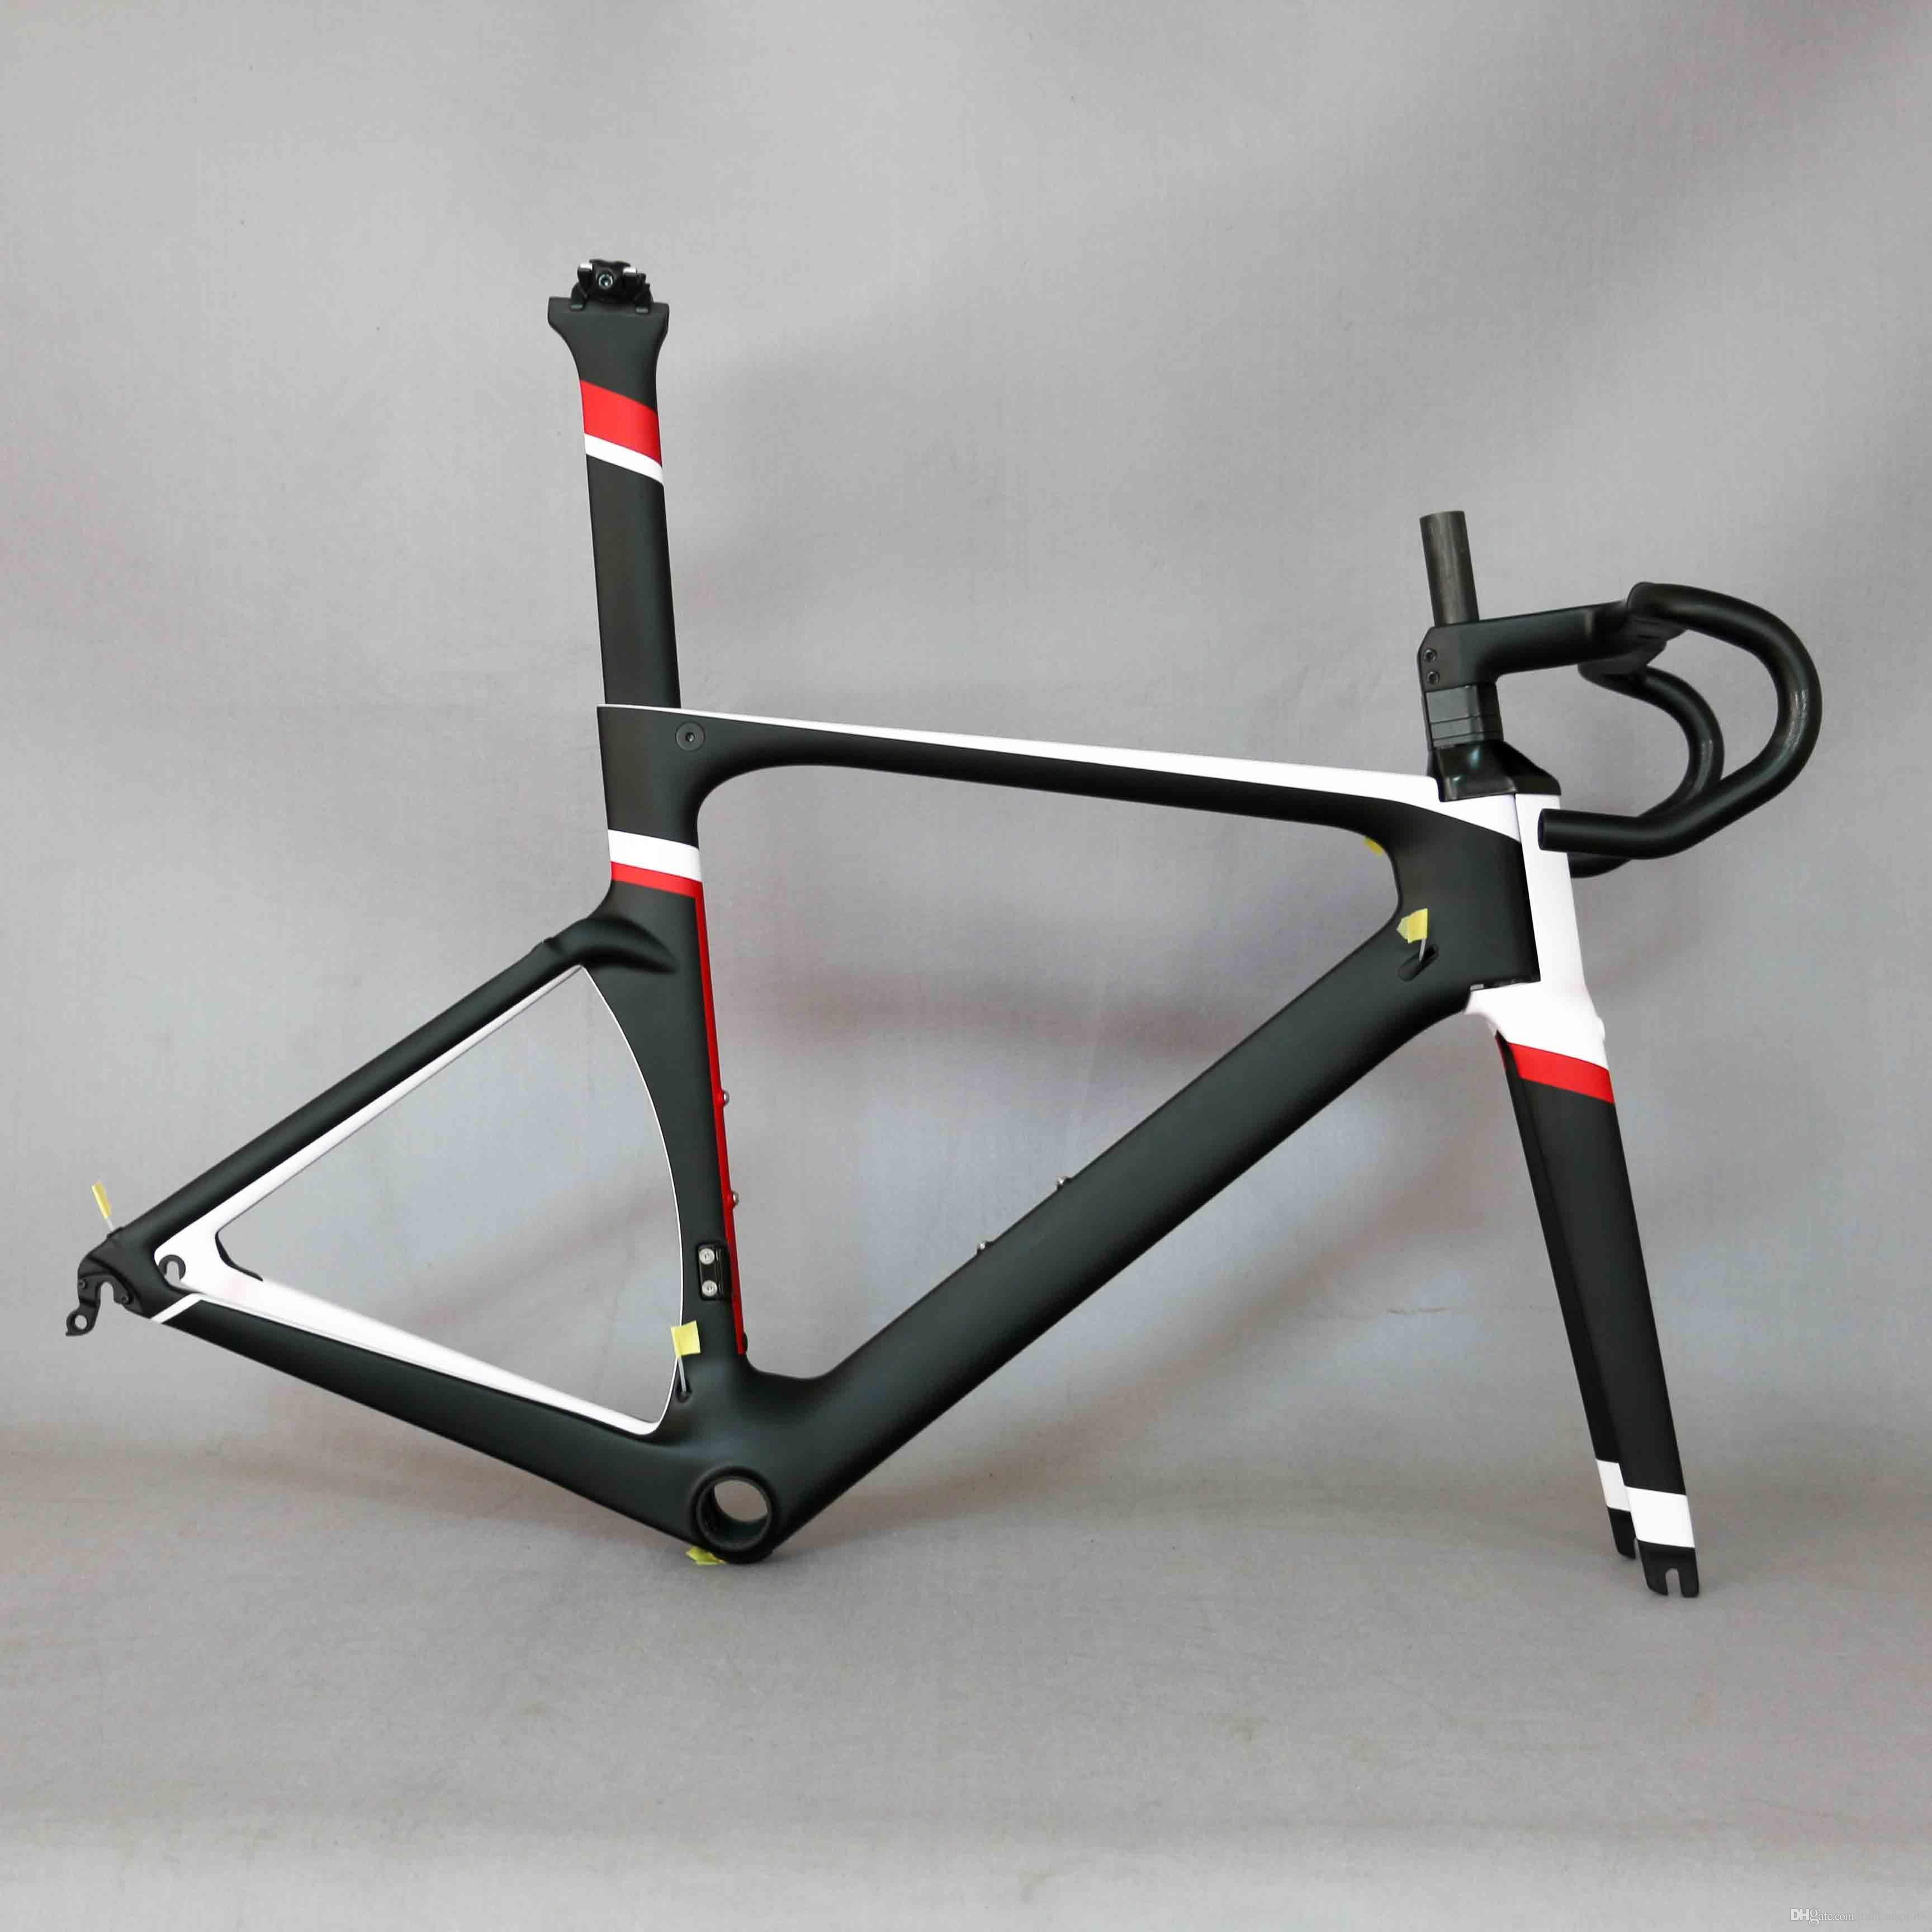 662ab6315bb Carbon Bike Parts New Design FM005 Road Bikes Carbon Frameset With  Handlebar 2018 AERO Design Top 10 Best Road Bikes Carbon Frame Mountain Bikes  Frames ...